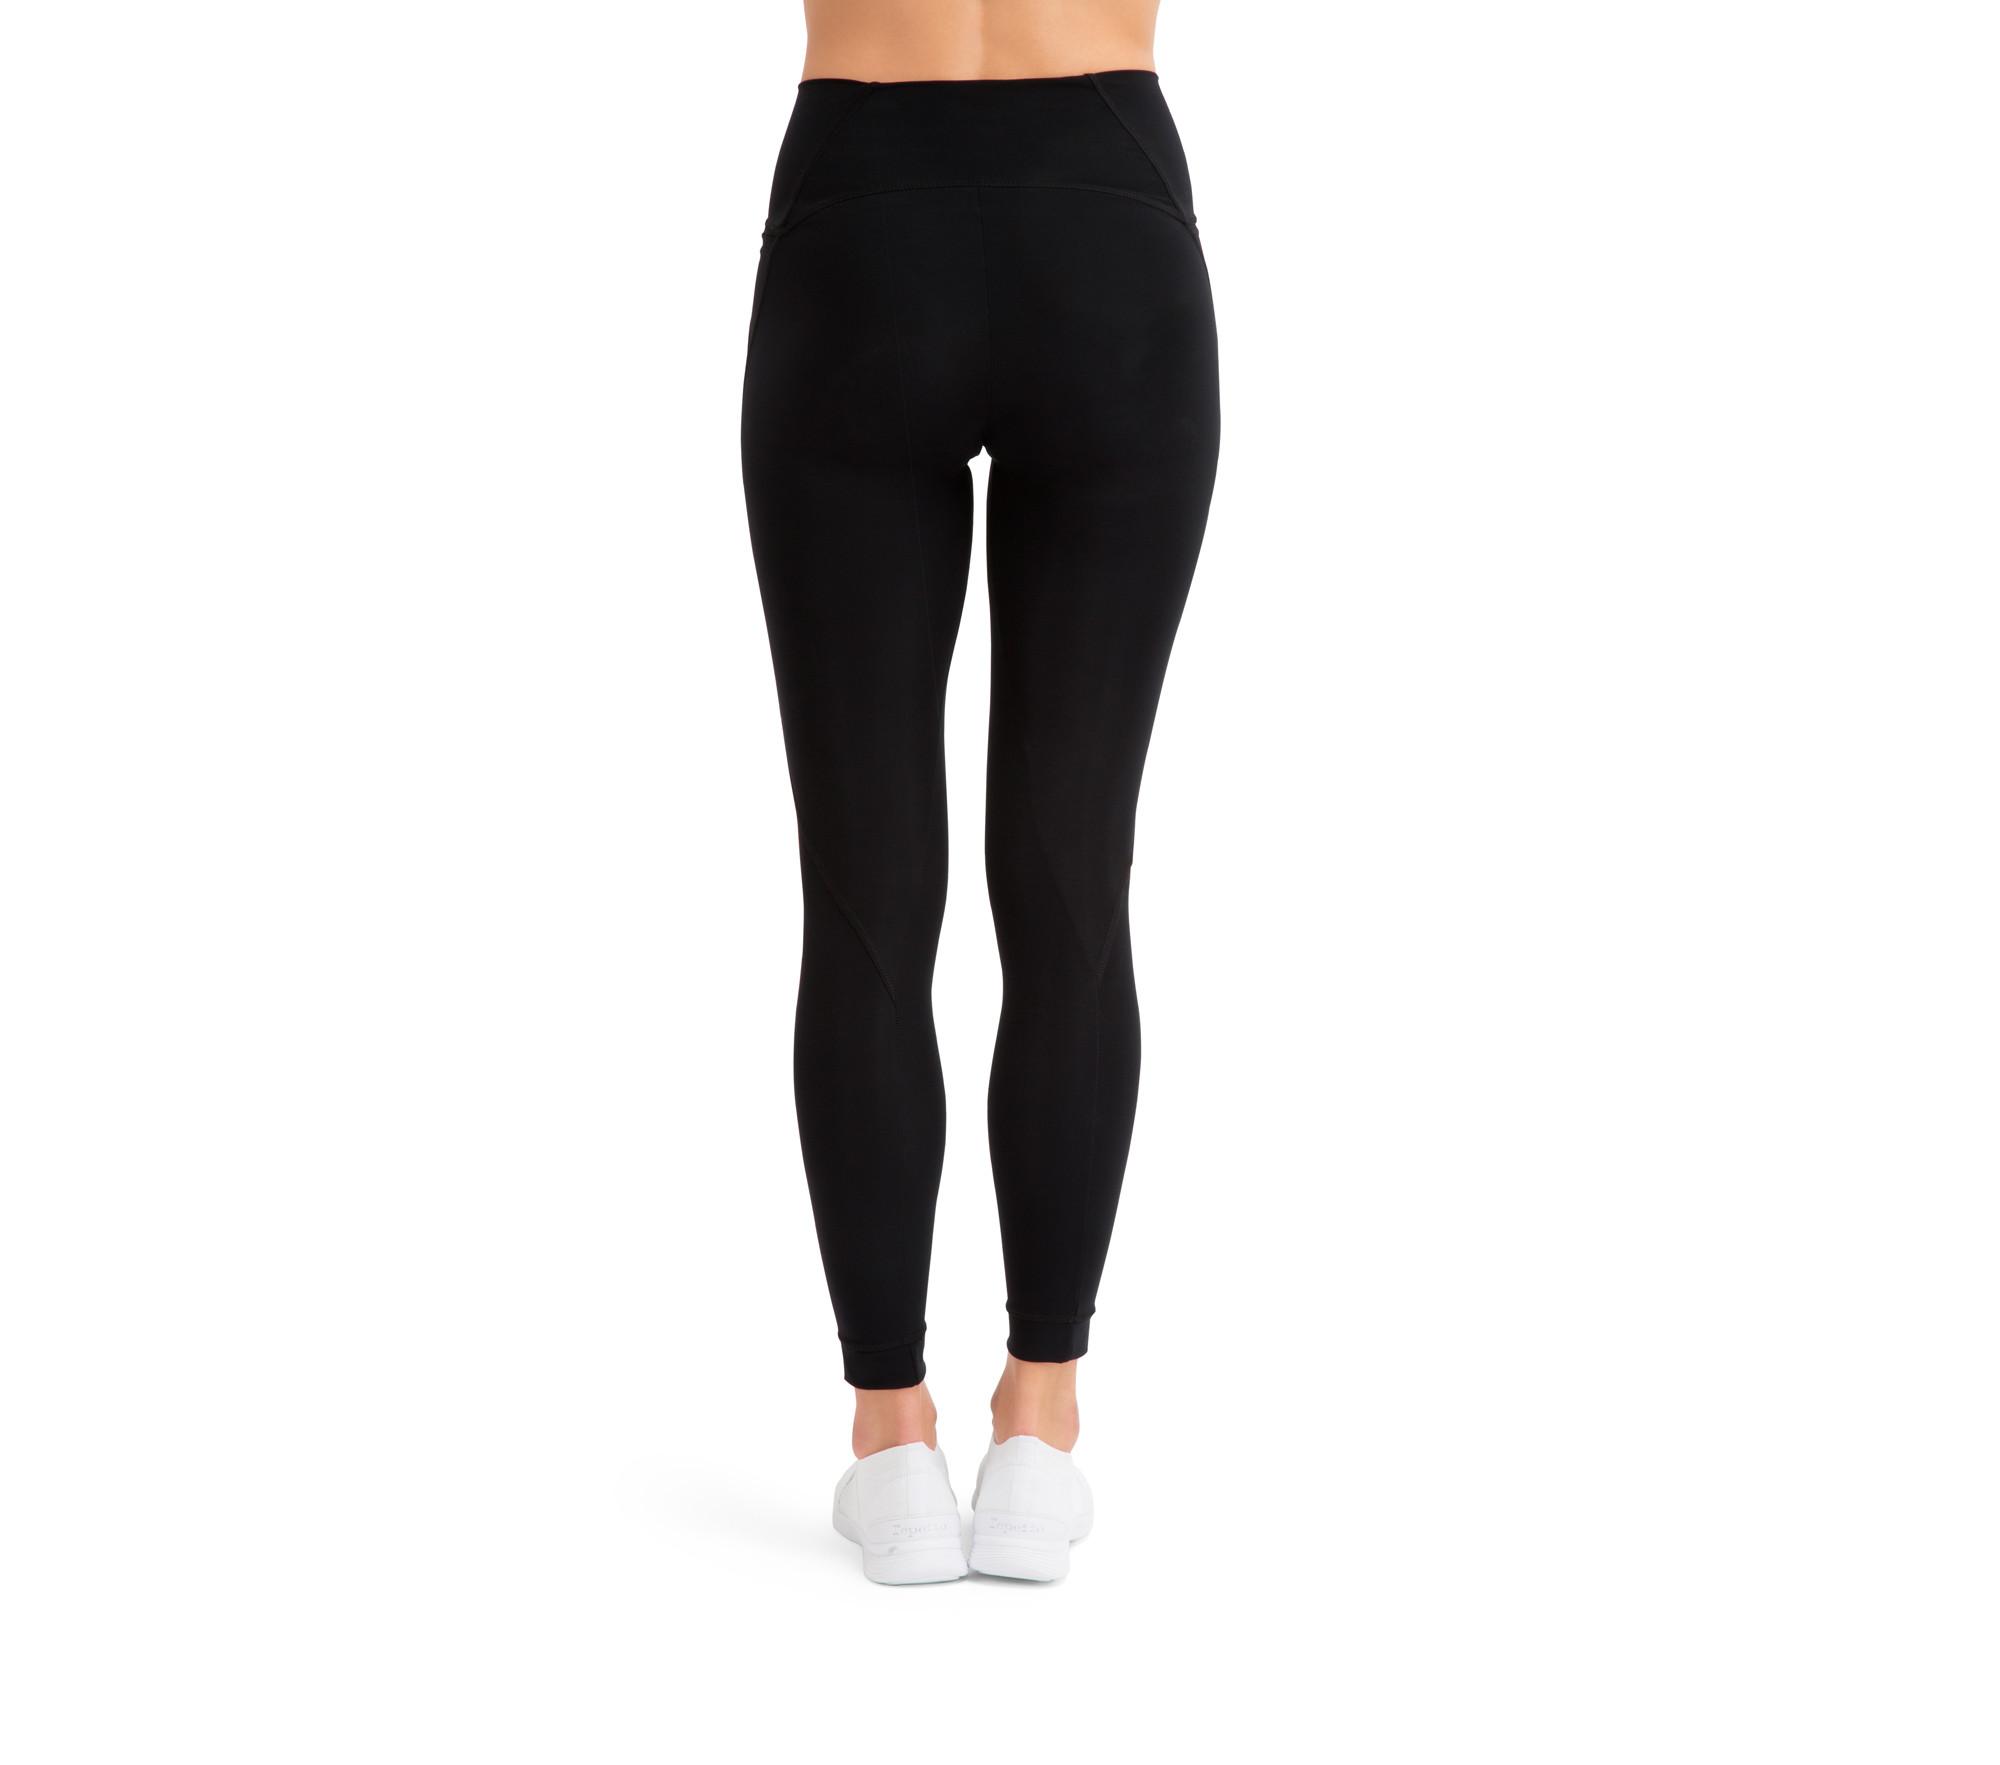 High stretch technical leggings